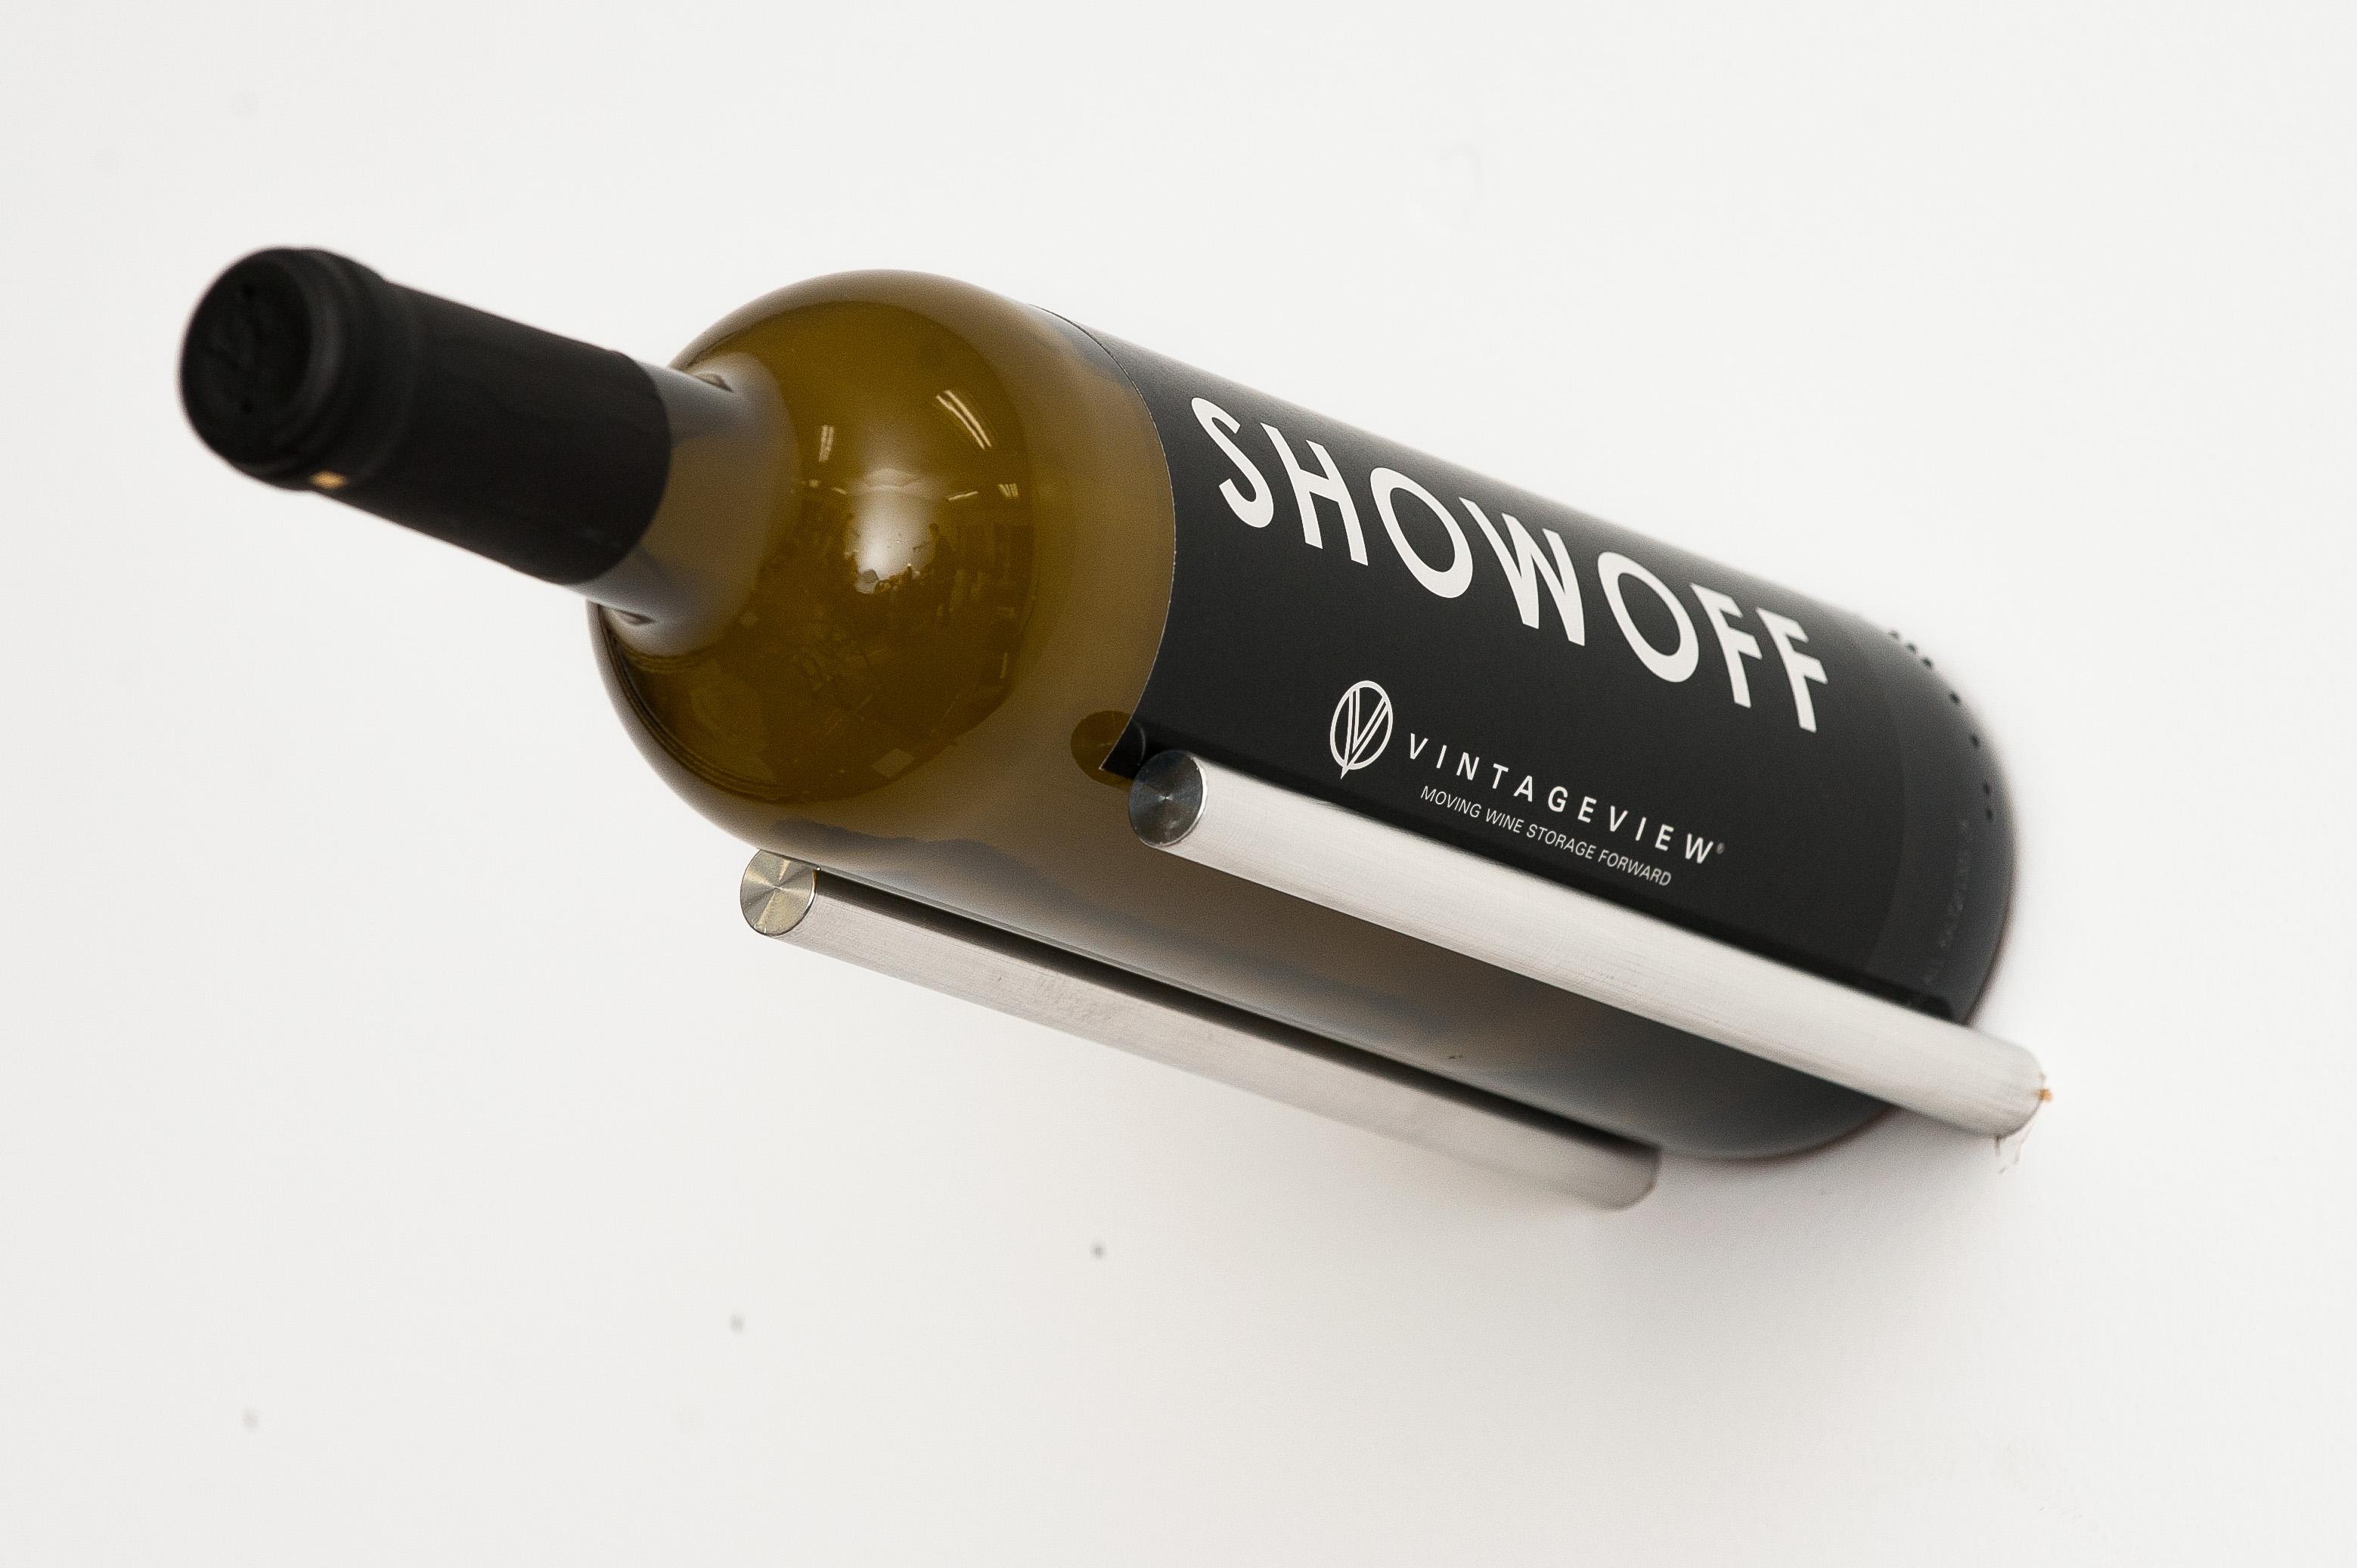 vino rails 1 bottle wall mounted metal wine rack peg cork forward